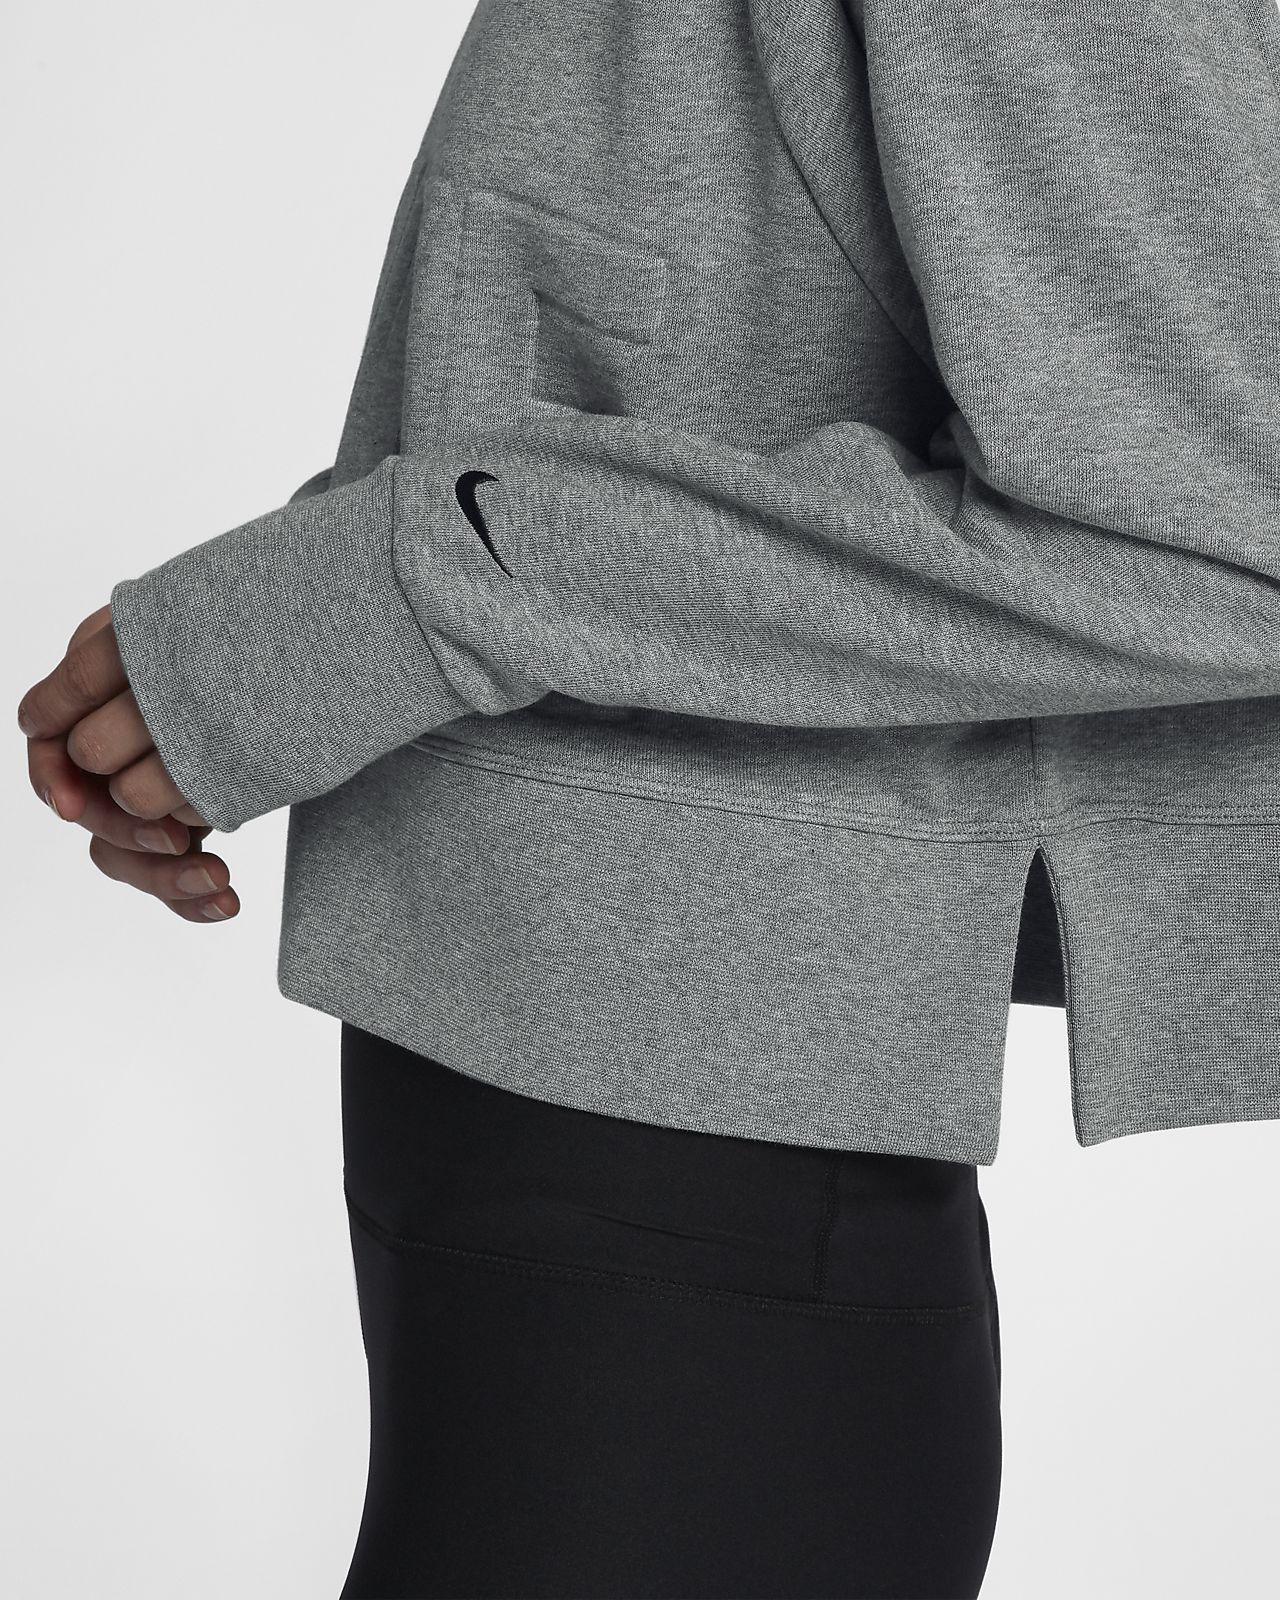 904b24e4a6d20 Nike Versa Women s Long-Sleeve Training Top. Nike.com AU